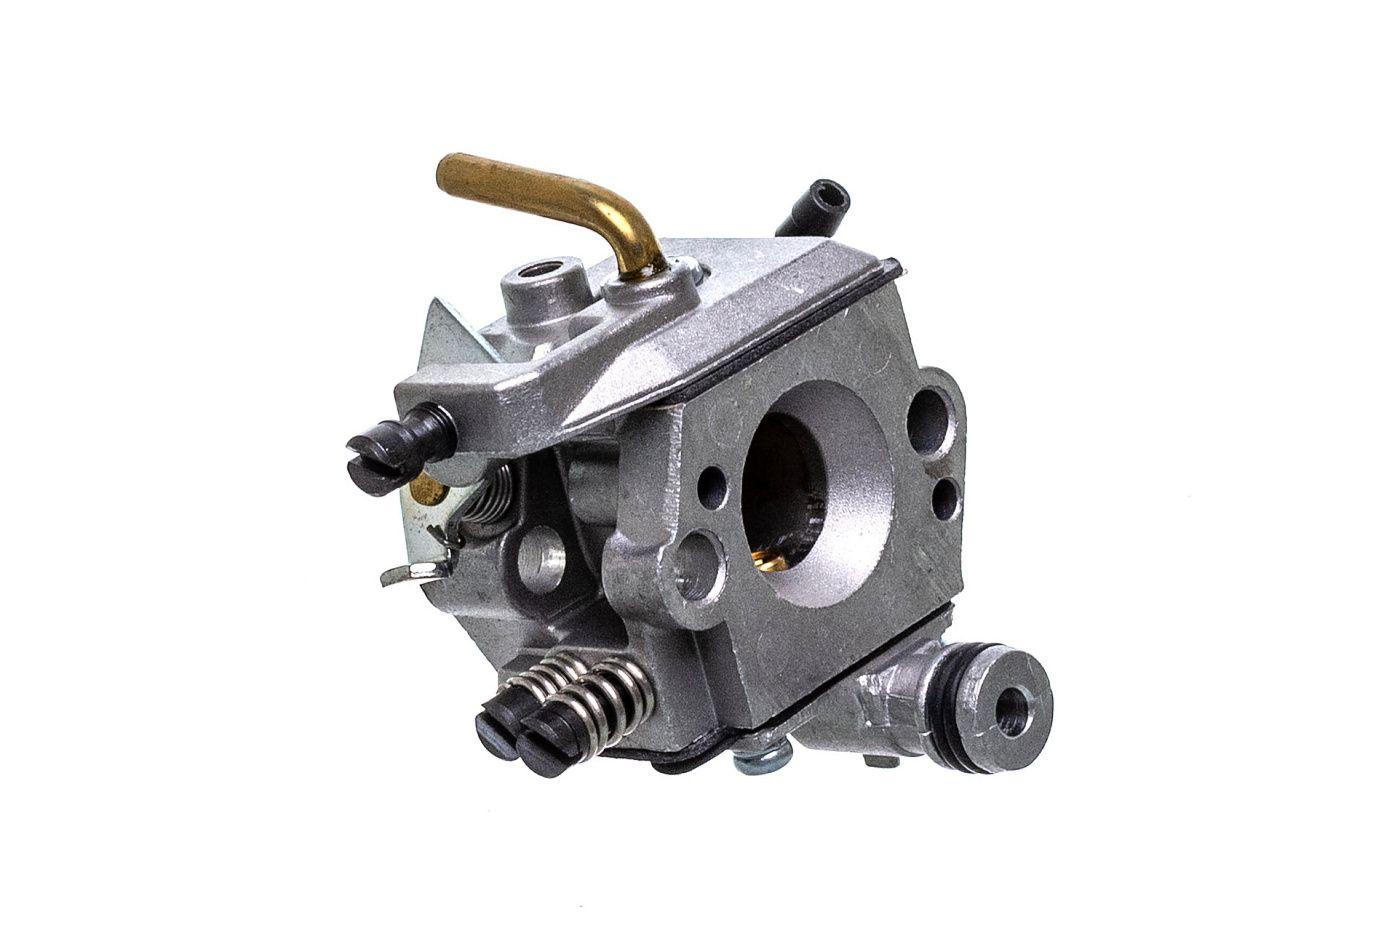 Karburátor Stihl MS240 MS260 024 026 s kompenzátorem (1121 120 0602)